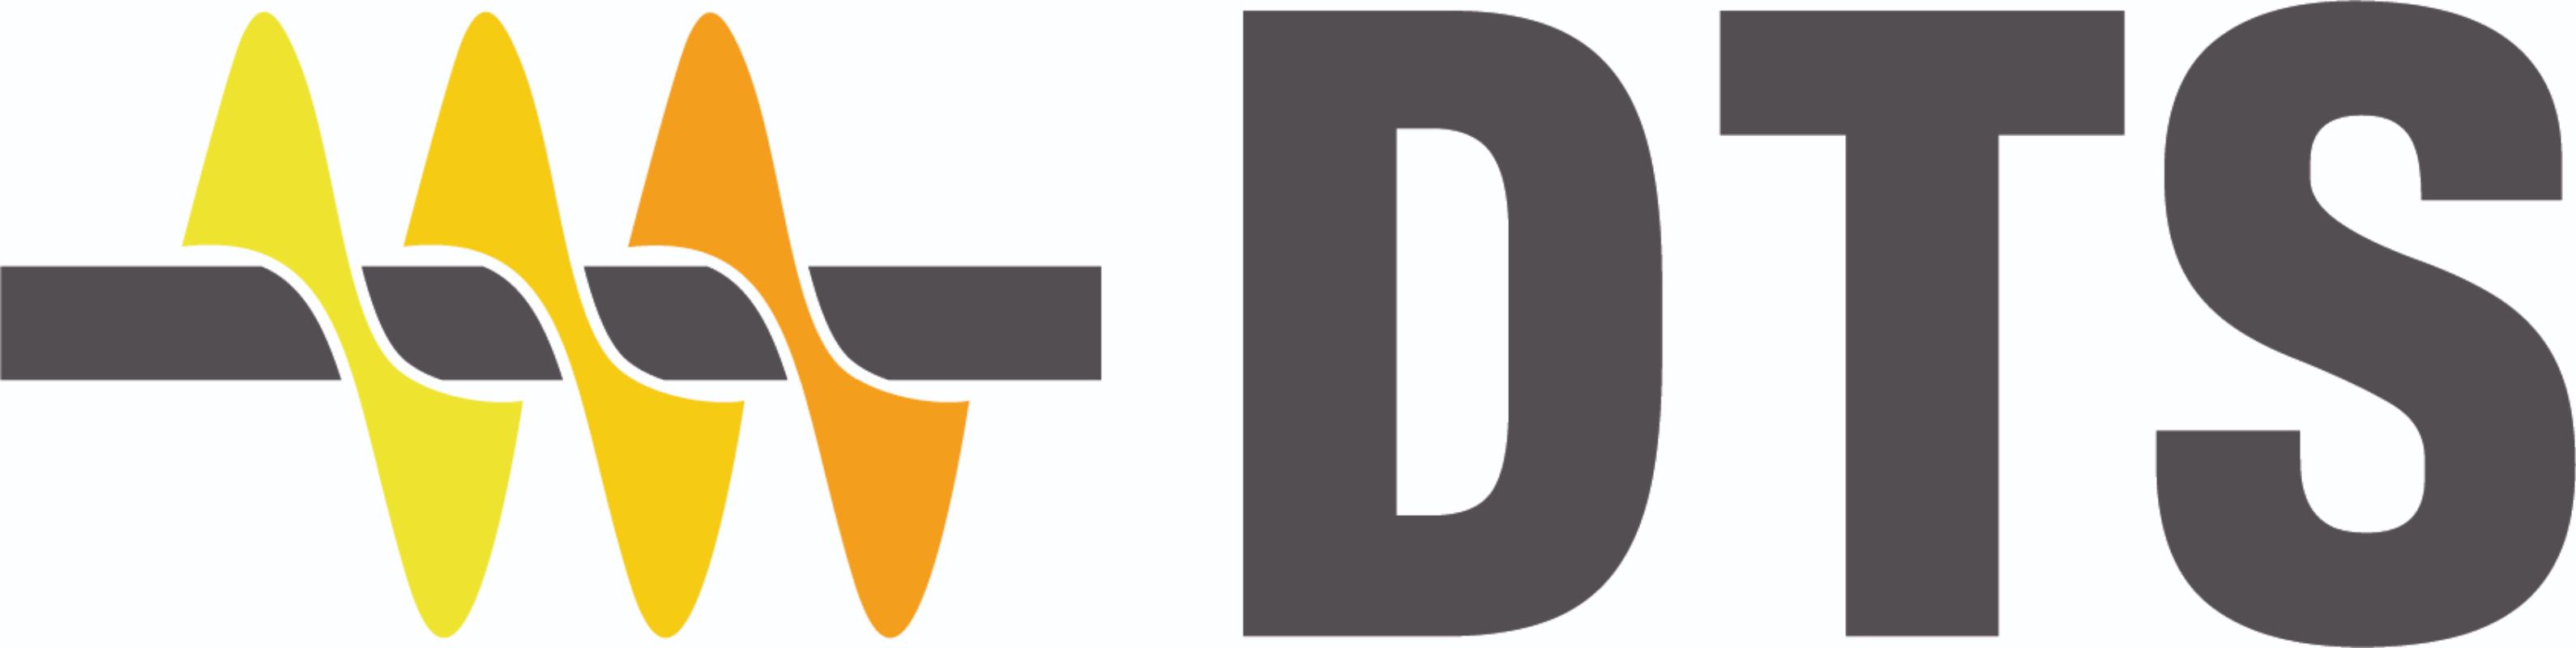 Dutch TecSource  logo